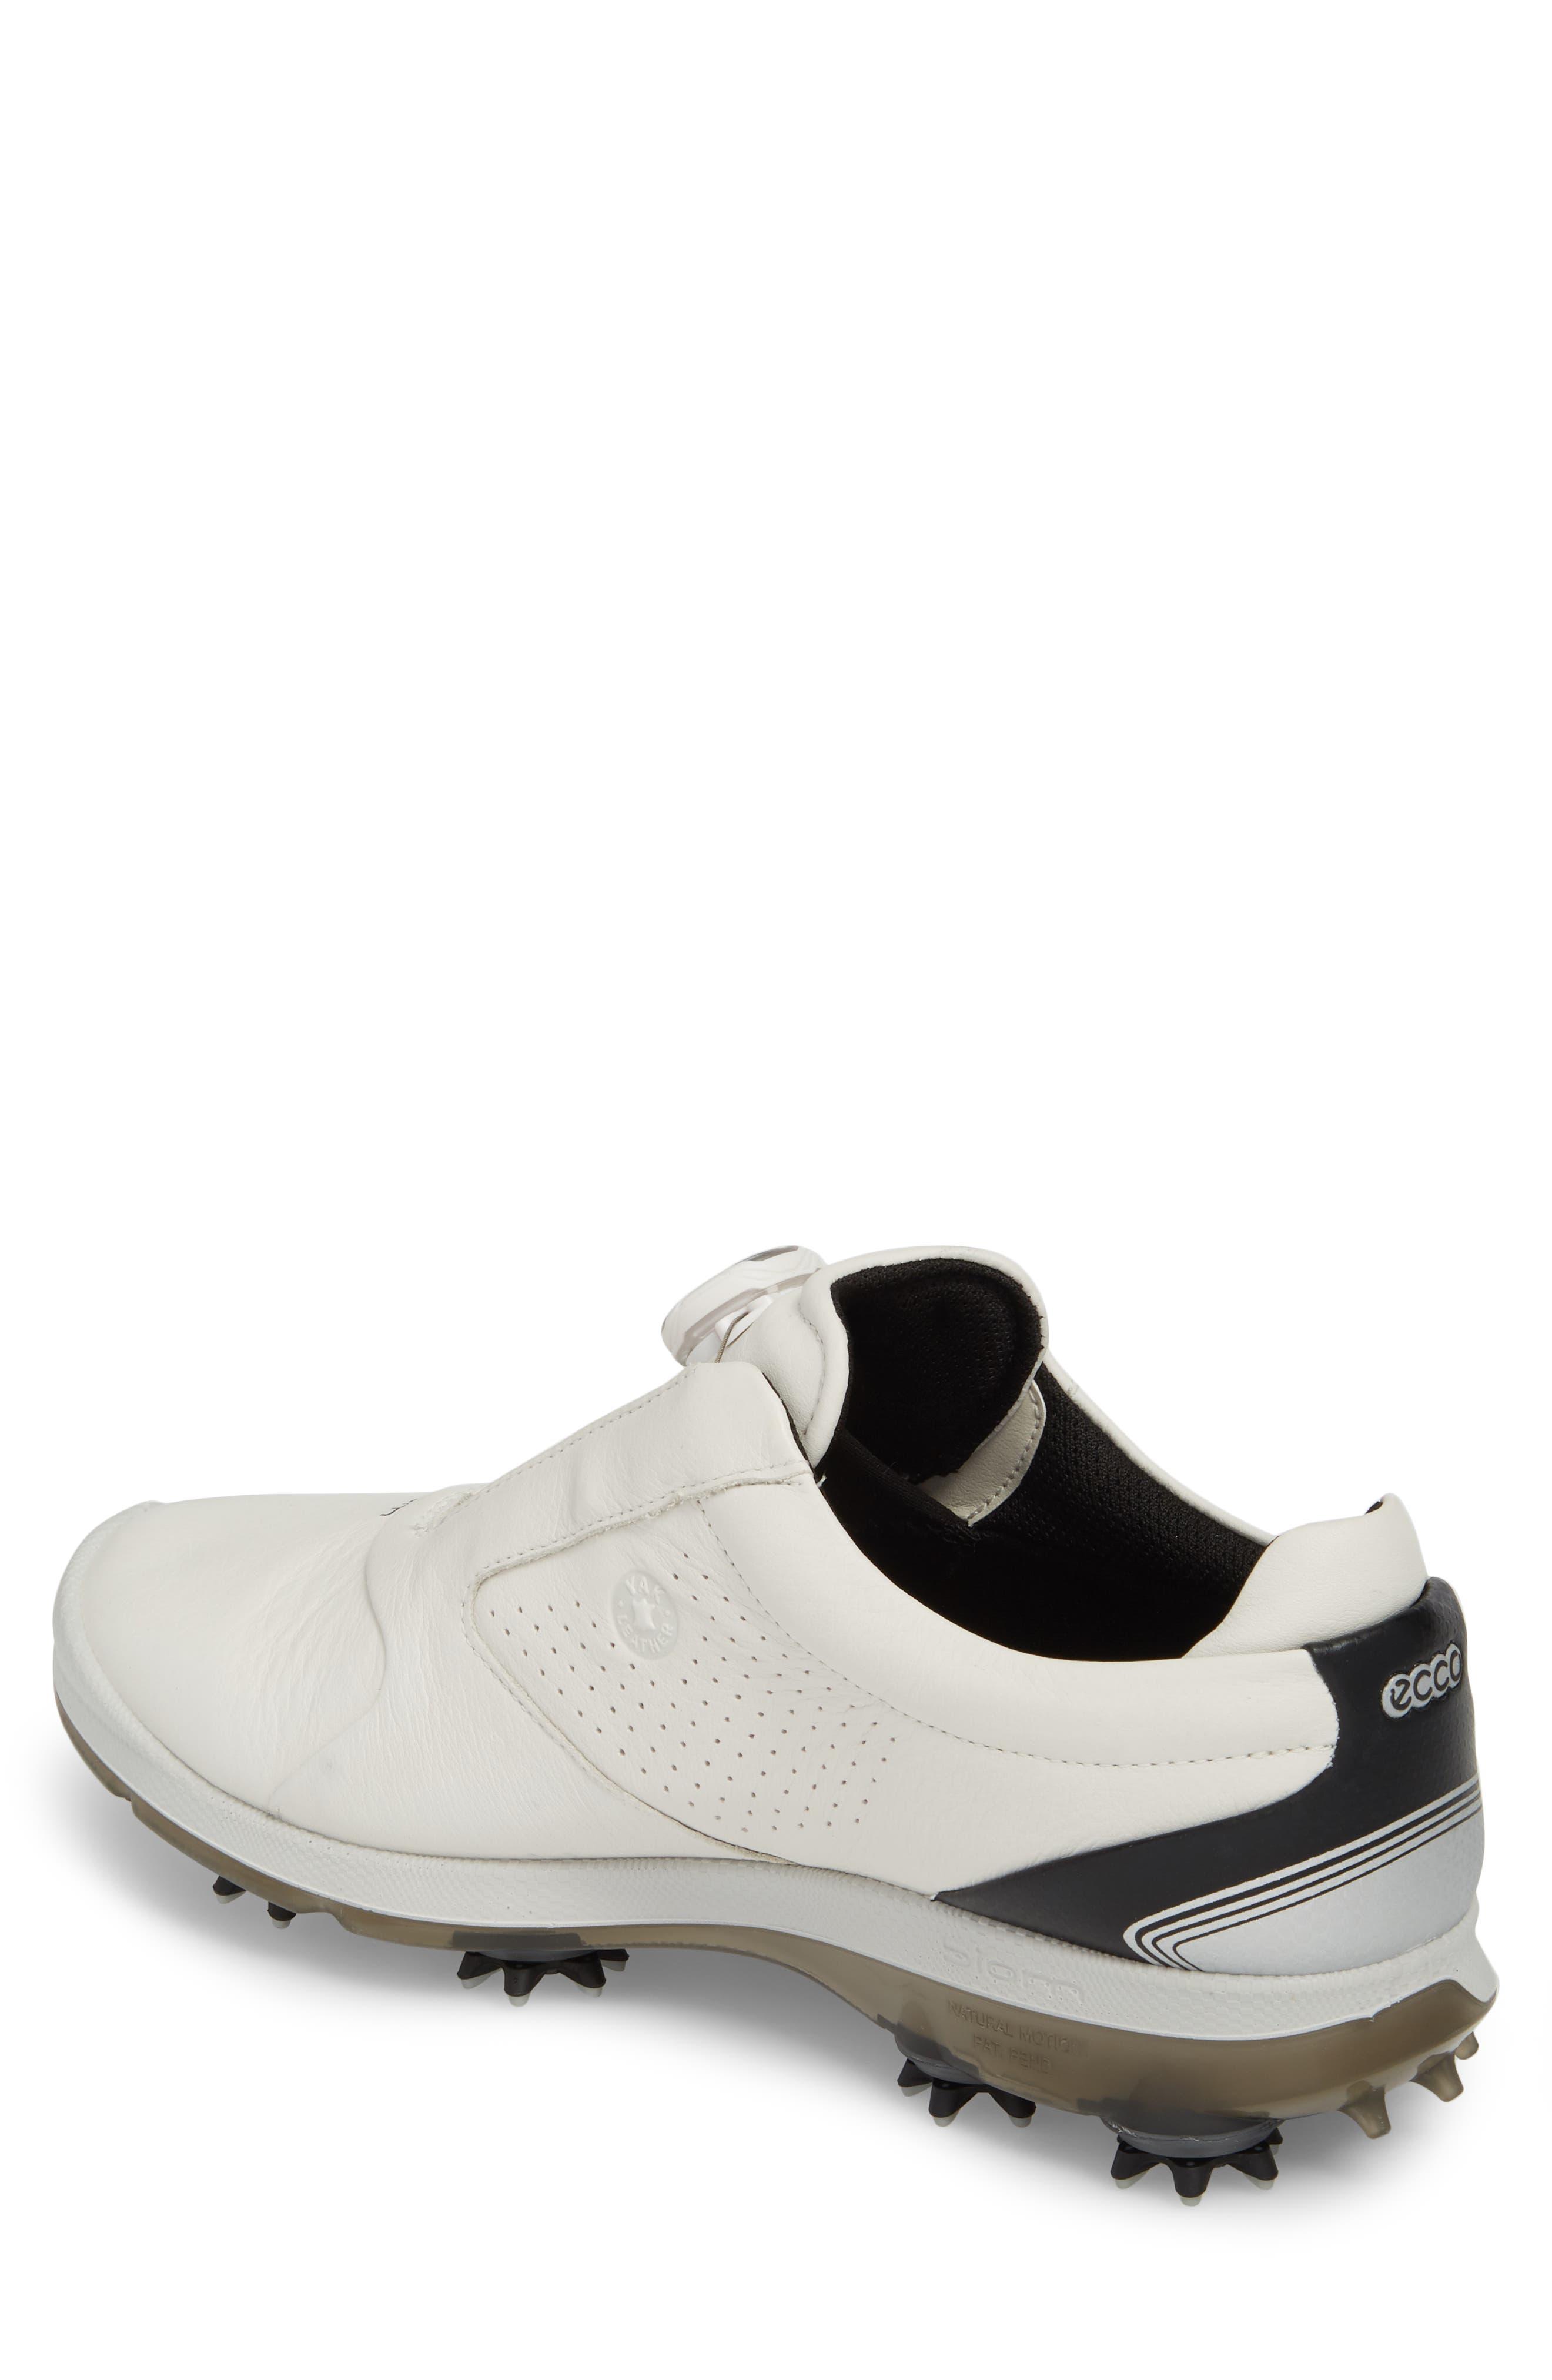 BIOM 2 BOA Gore-Tex<sup>®</sup> Golf Shoe,                             Alternate thumbnail 2, color,                             WHITE/ BLACK LEATHER